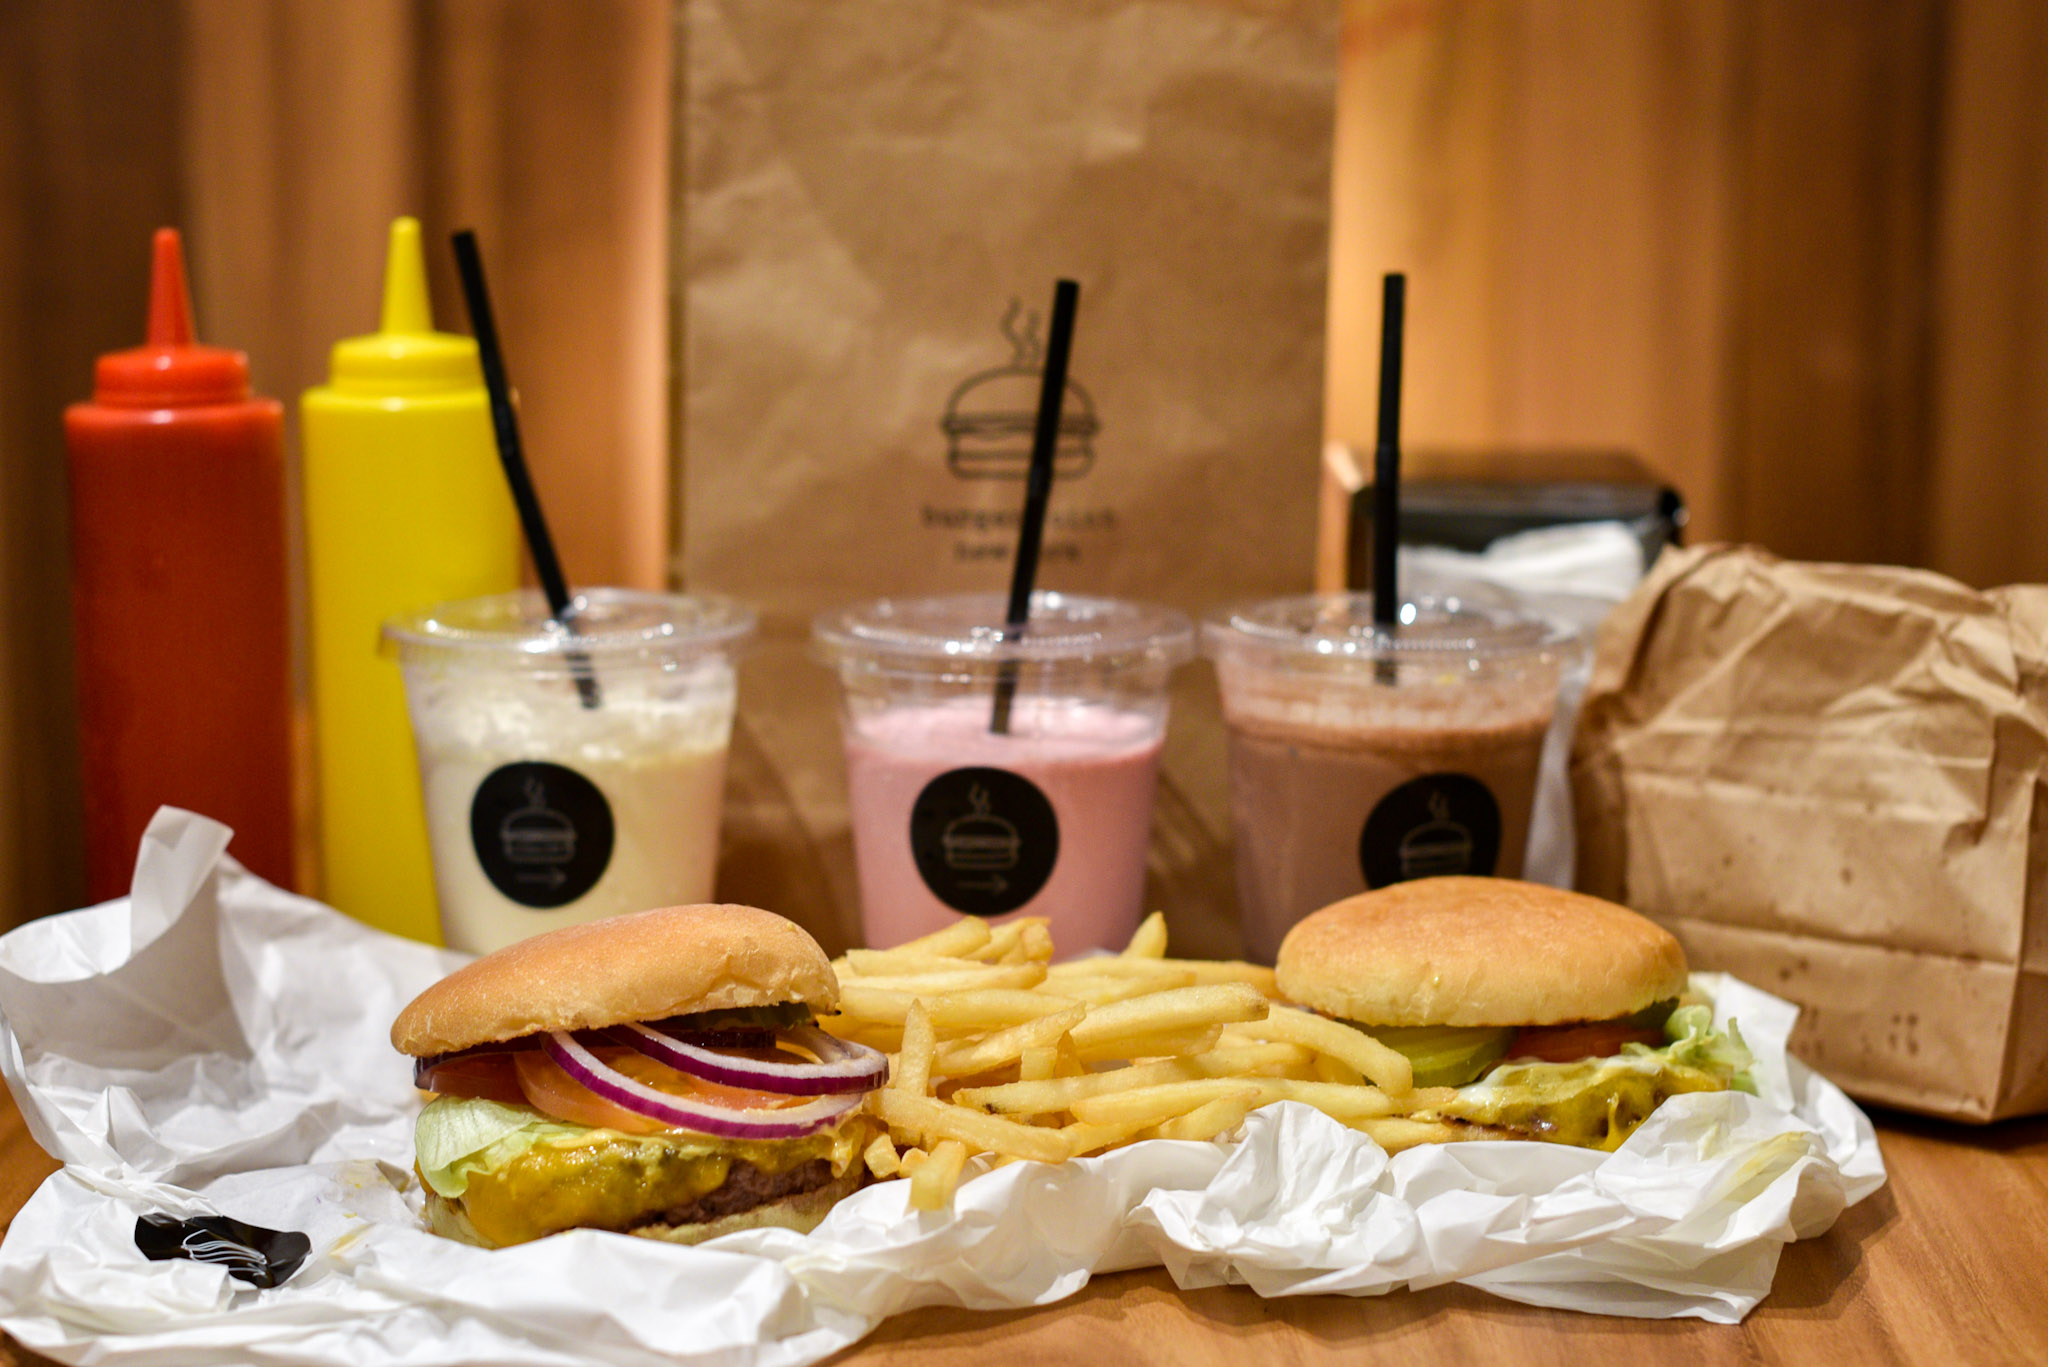 Milkshakes and Burgers  Burger Joint Singapore